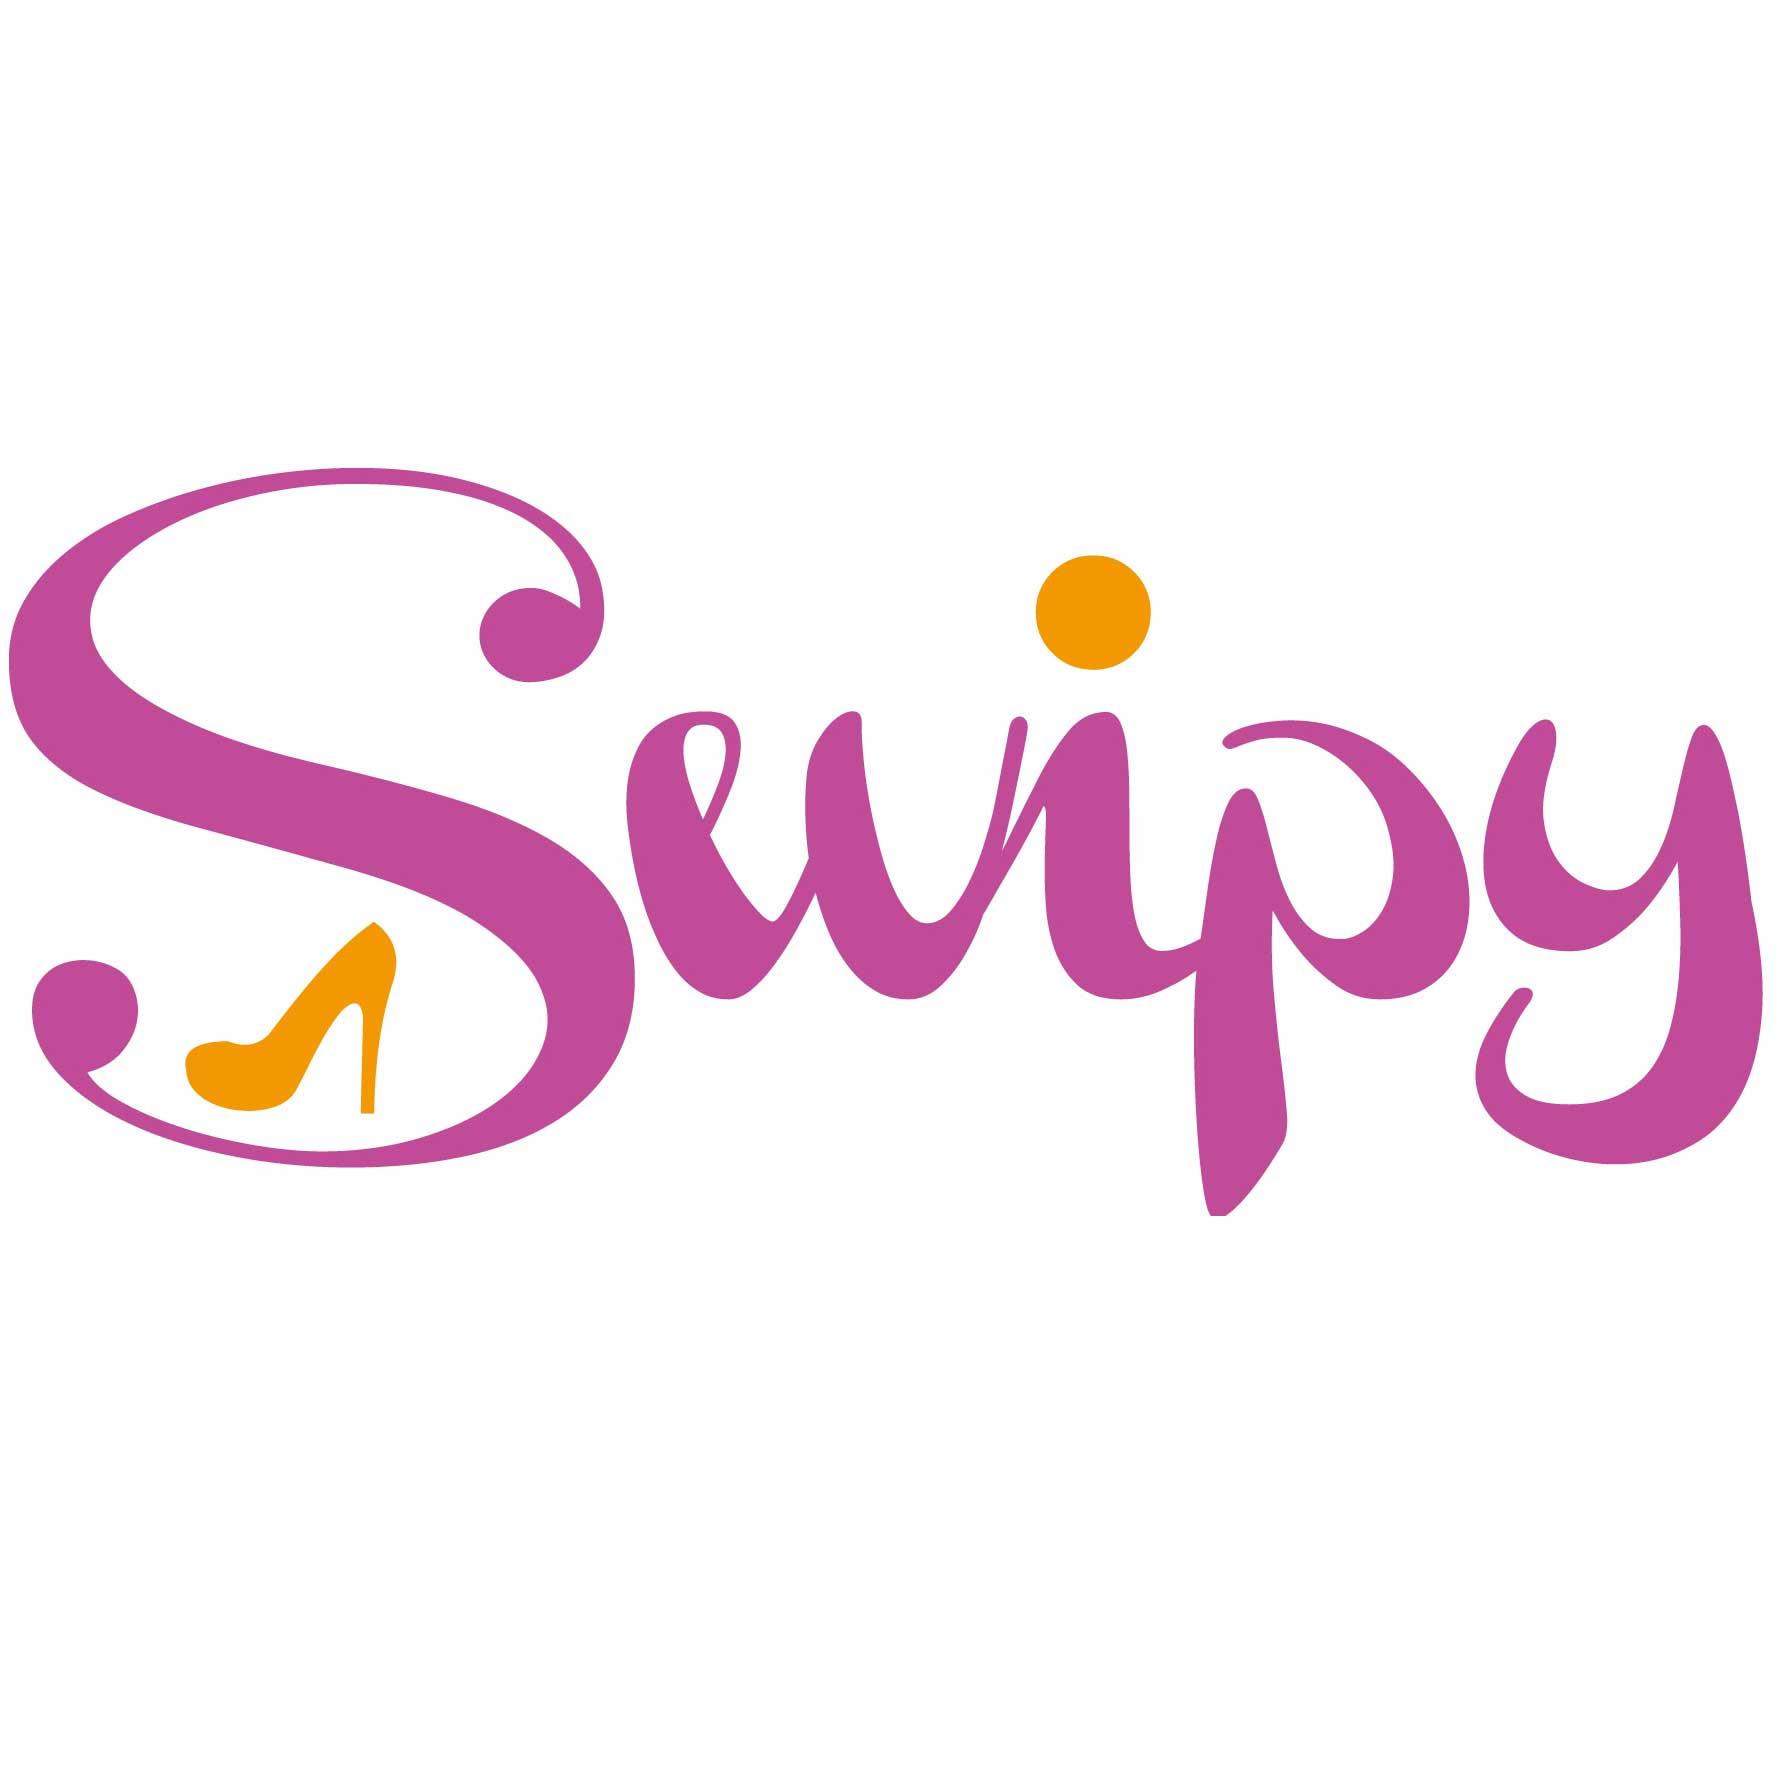 Swipy